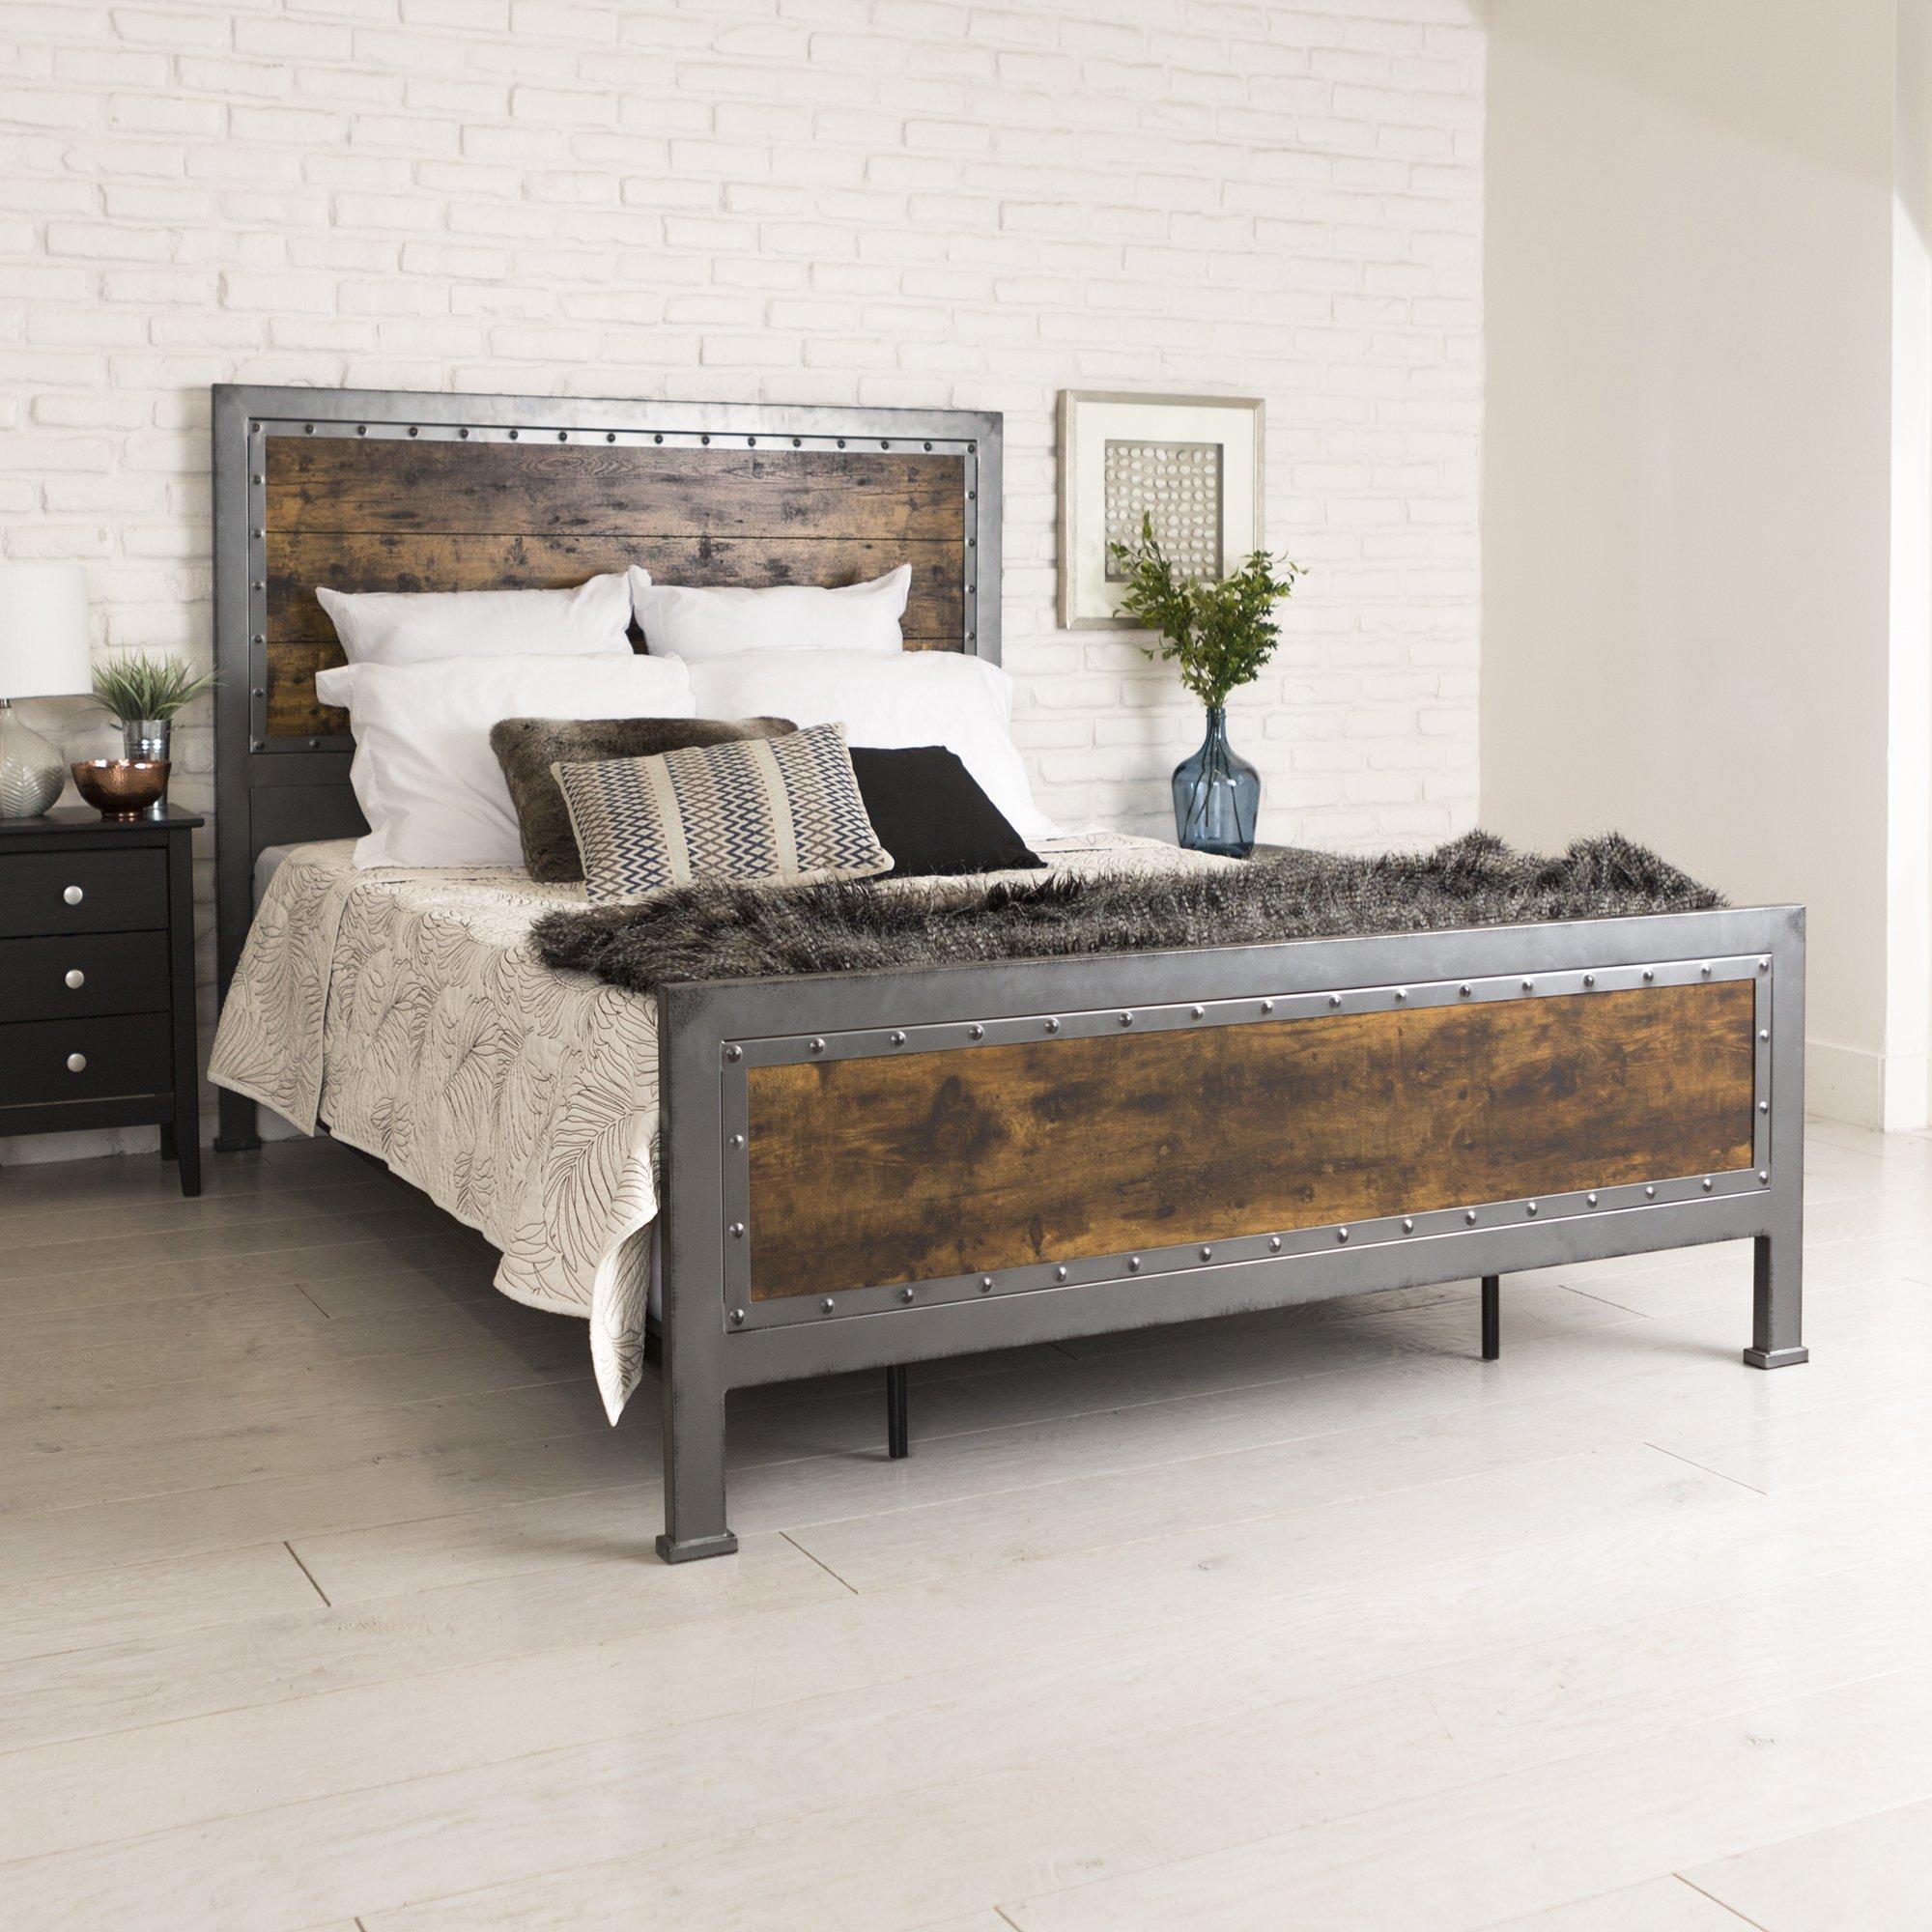 Amazon.com & Rustic Bedroom Furniture: Amazon.com